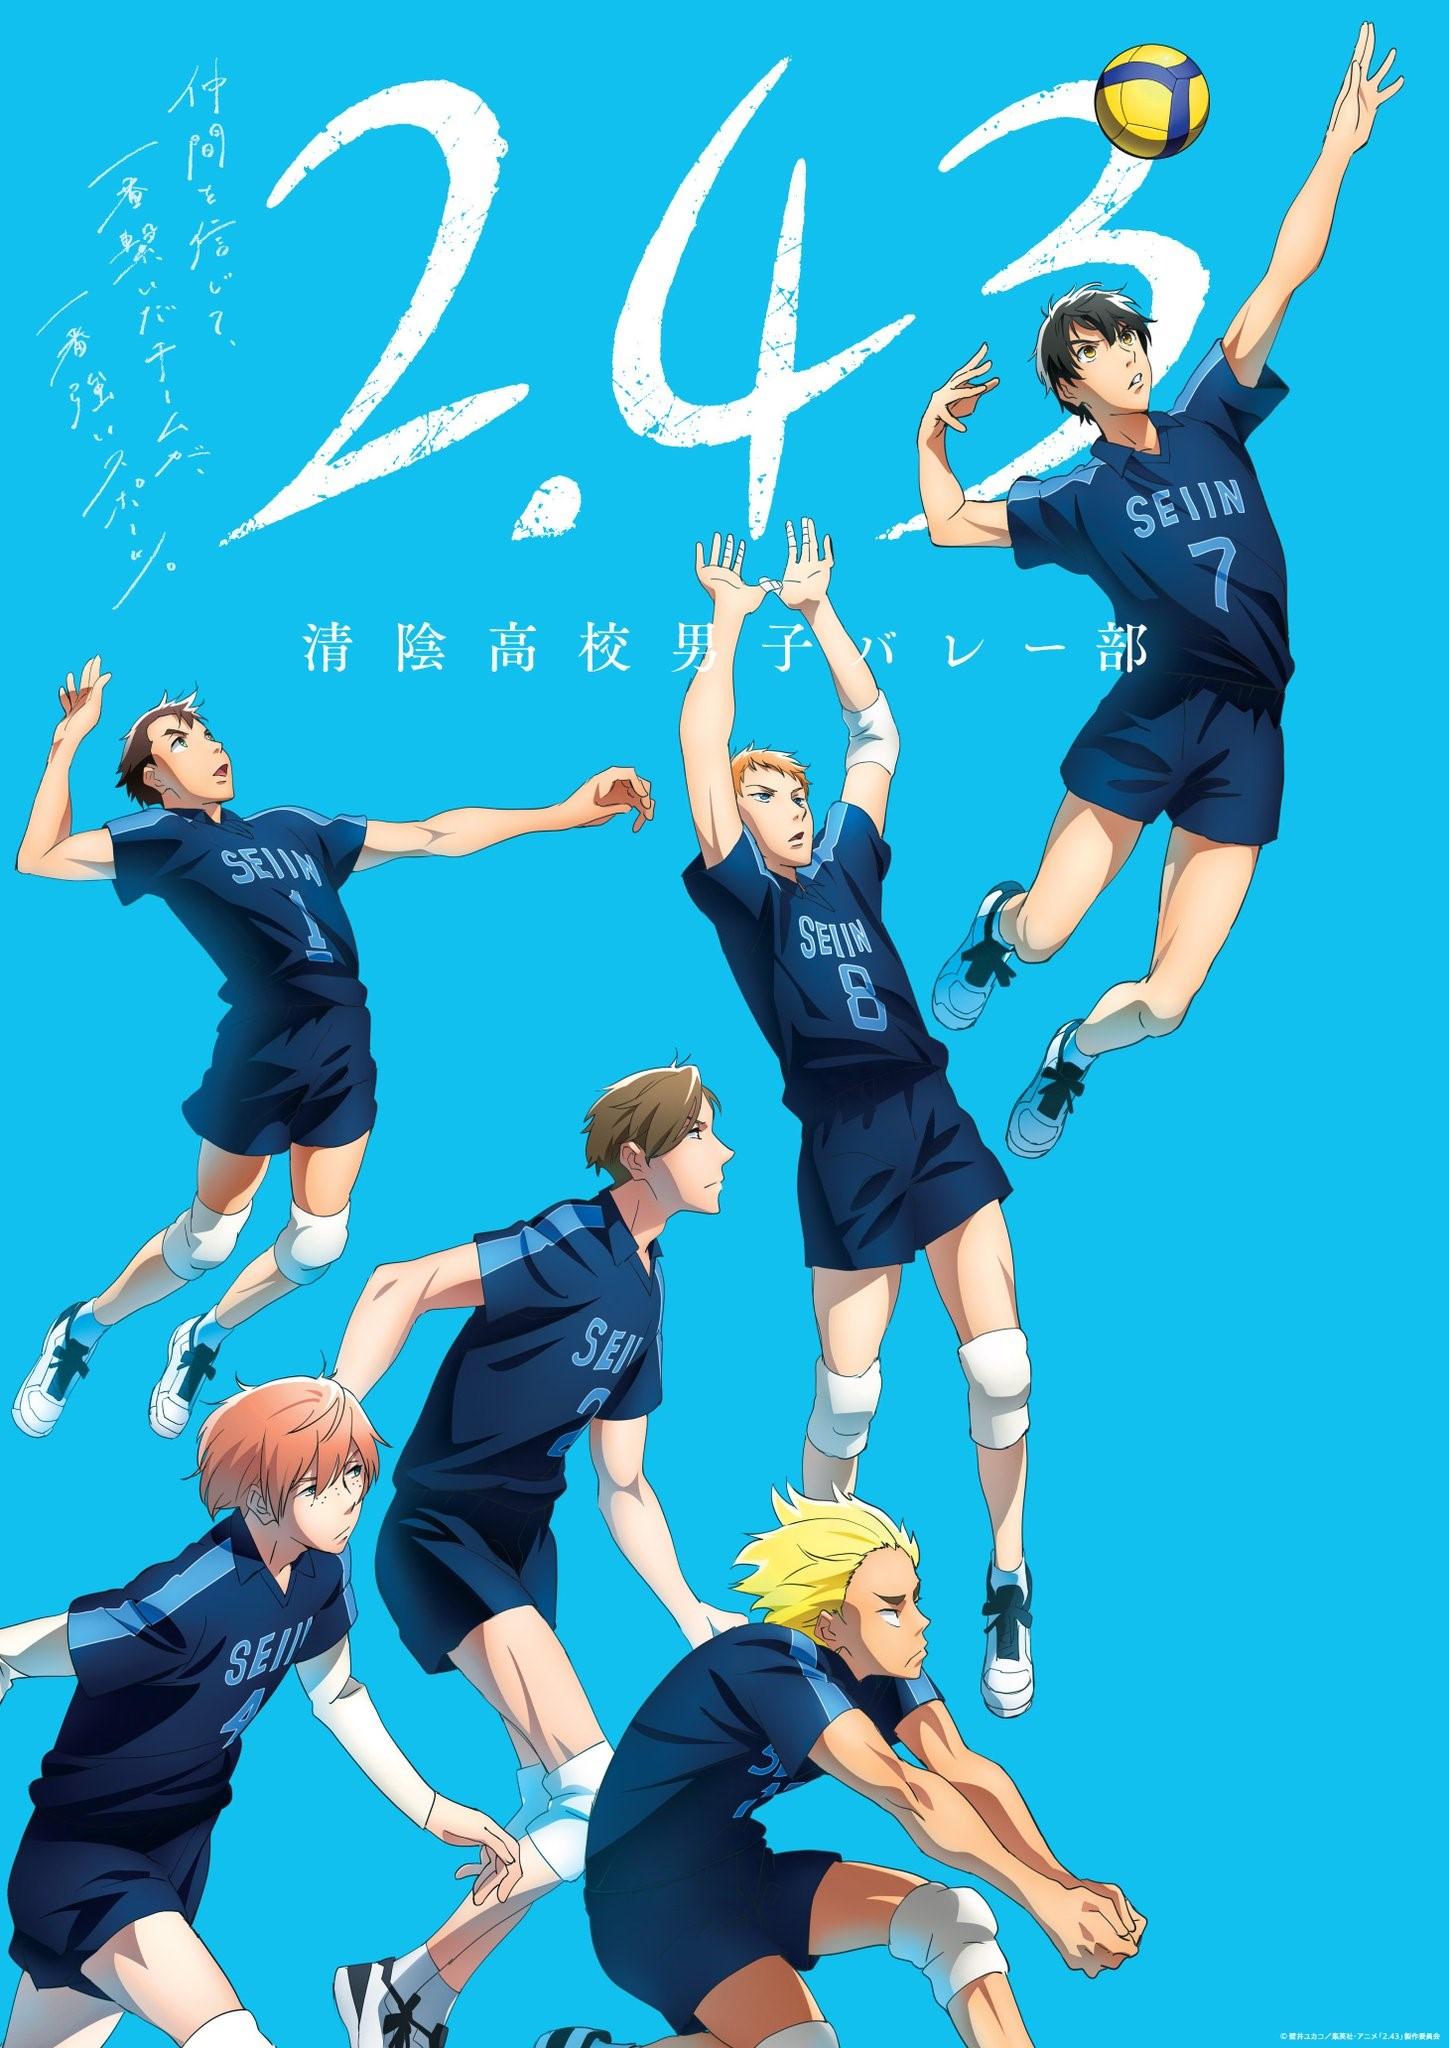 TVアニメ「2.43 清陰高校男子バレー部」Blu-ray&DVD BOX発売決定!